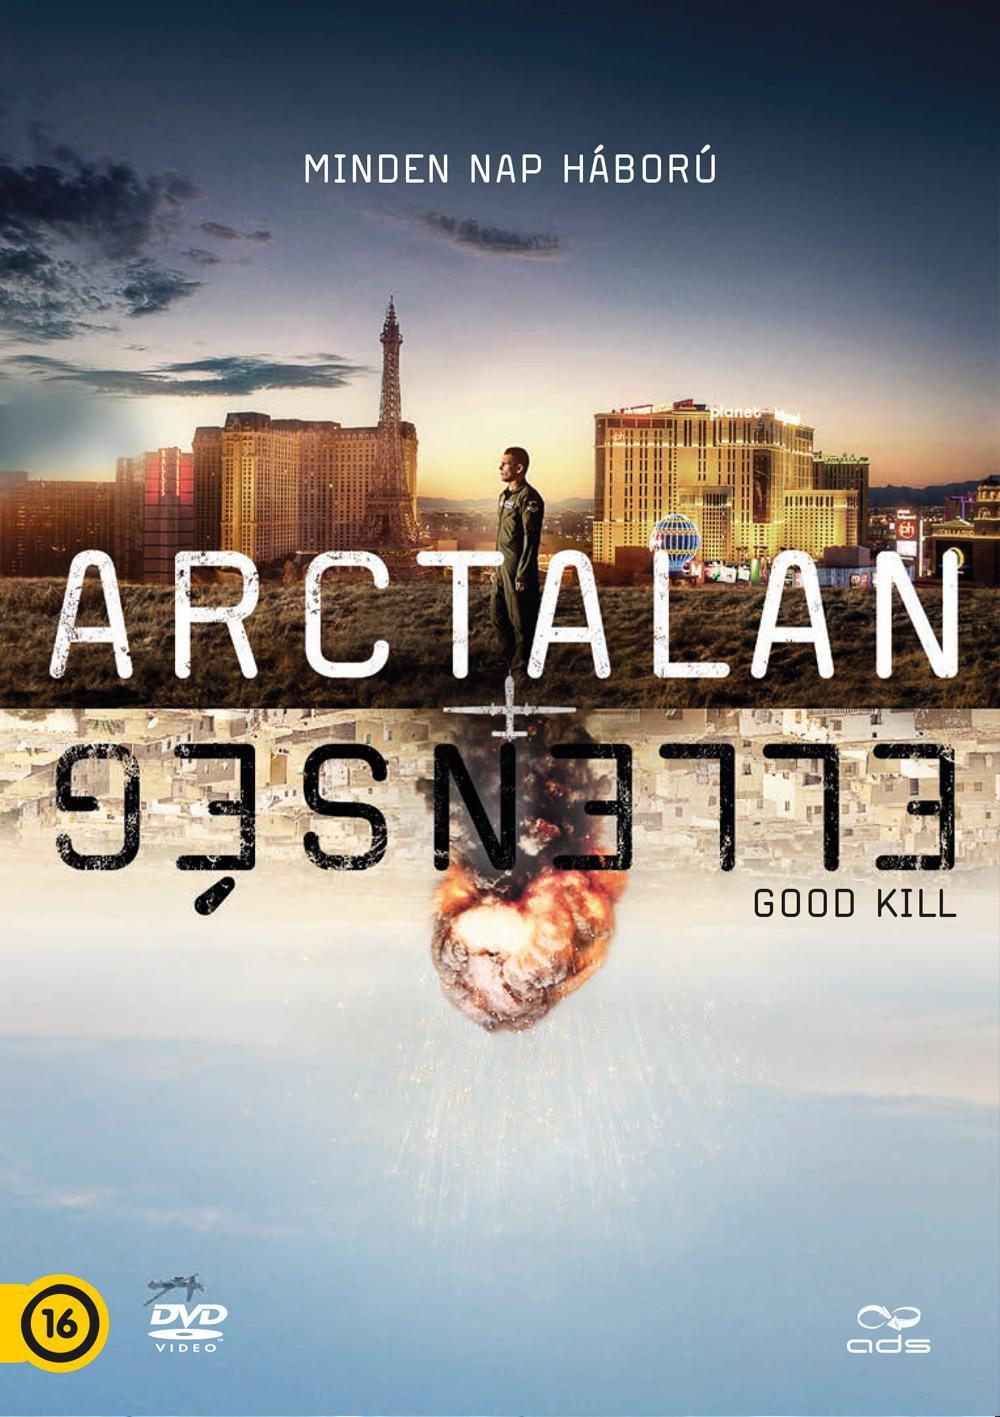 - ARCTALAN ELLENSÉG - DVD -